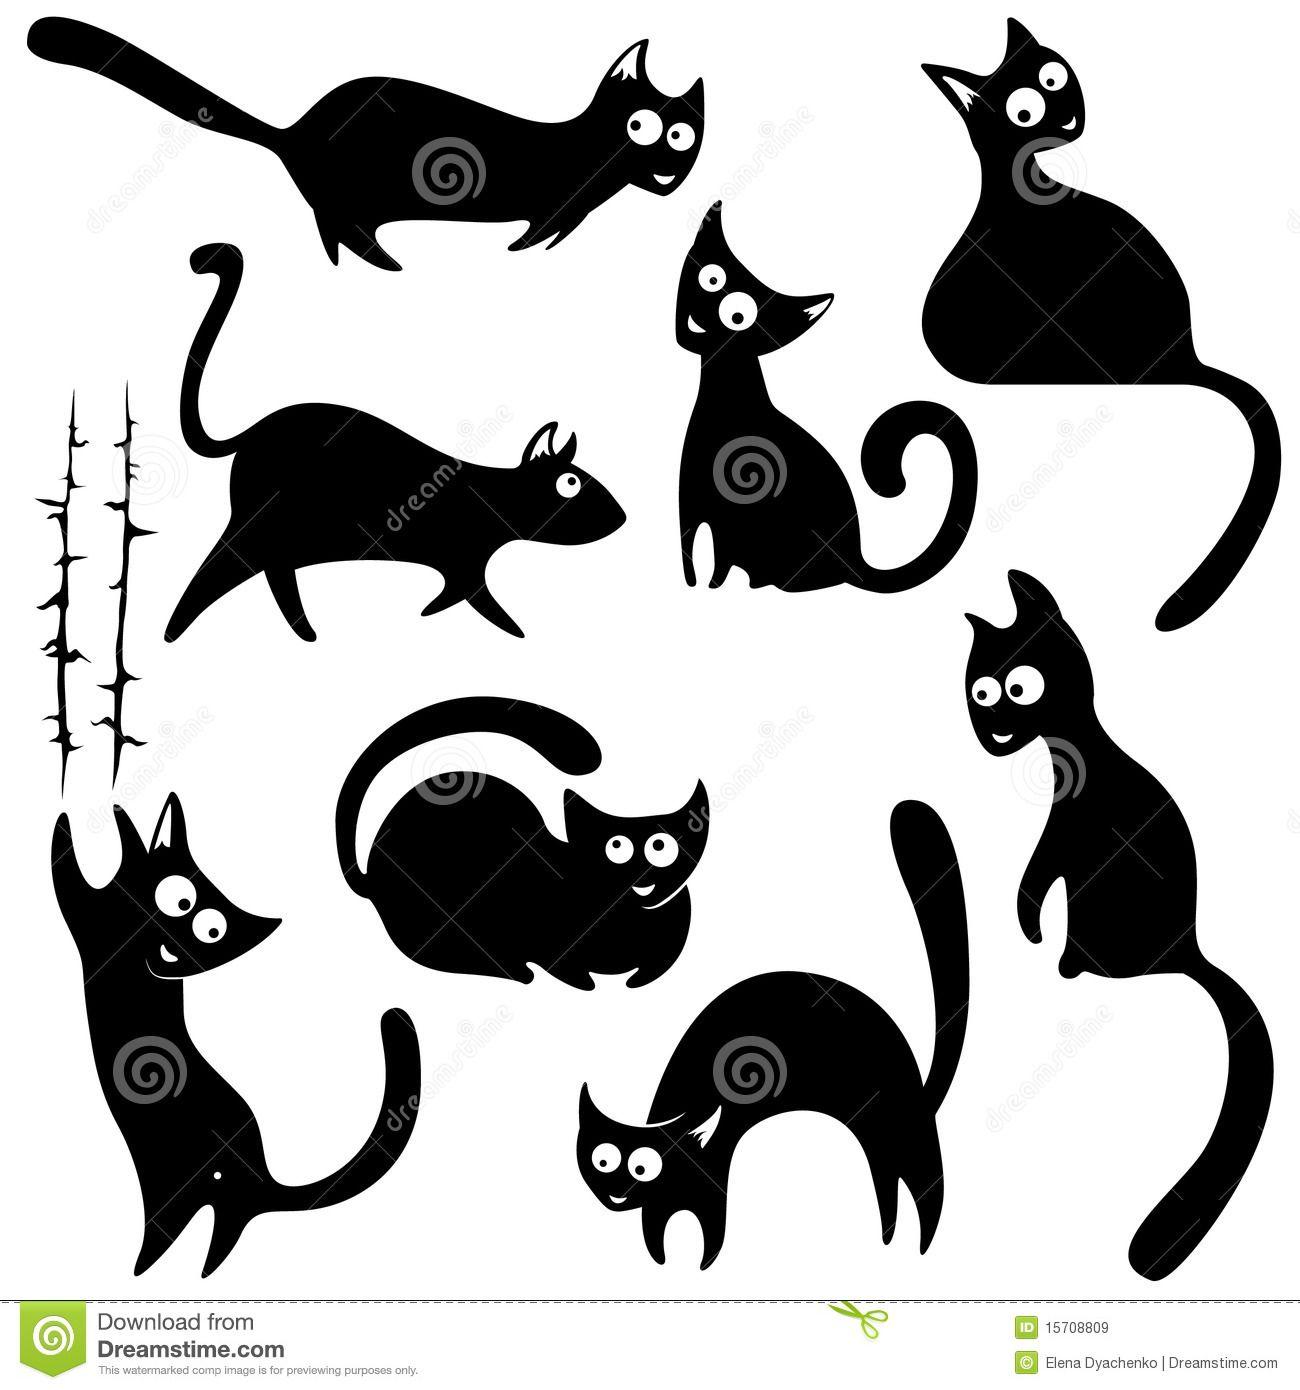 Рисунки силуэта кота